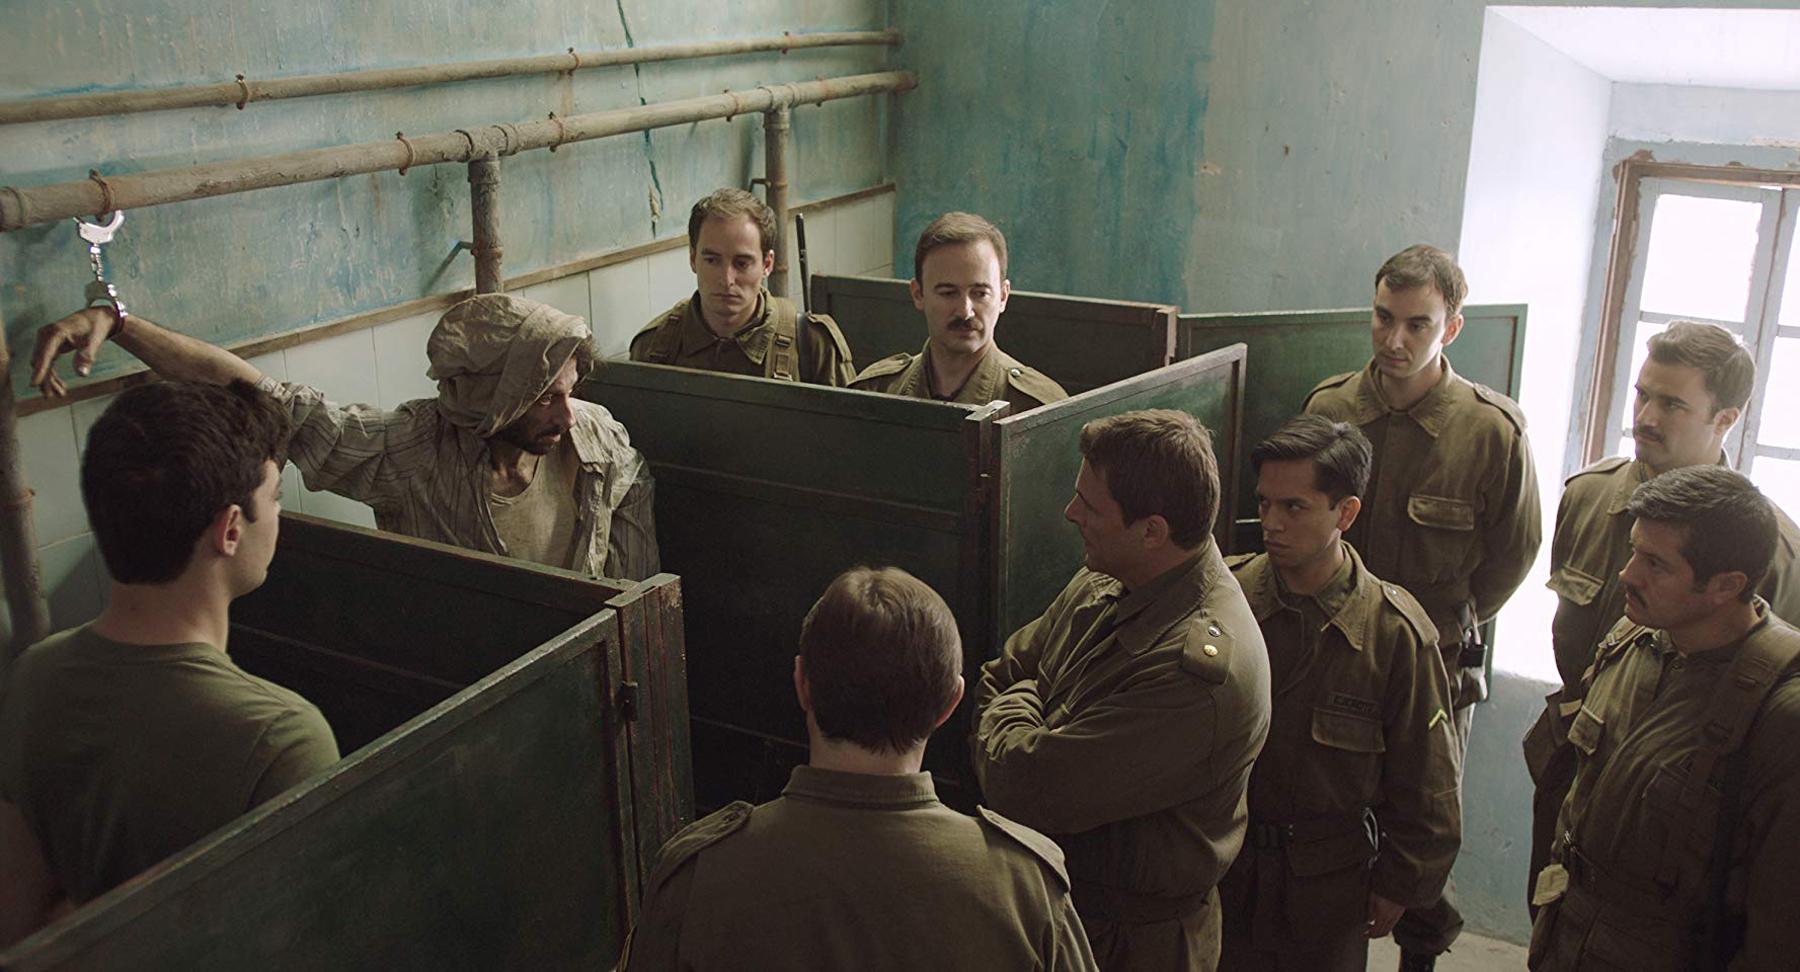 'La Noche de 12 Años,' Which Chronicles José Mujica's Years as a Political Prisoner, is Now on Netflix